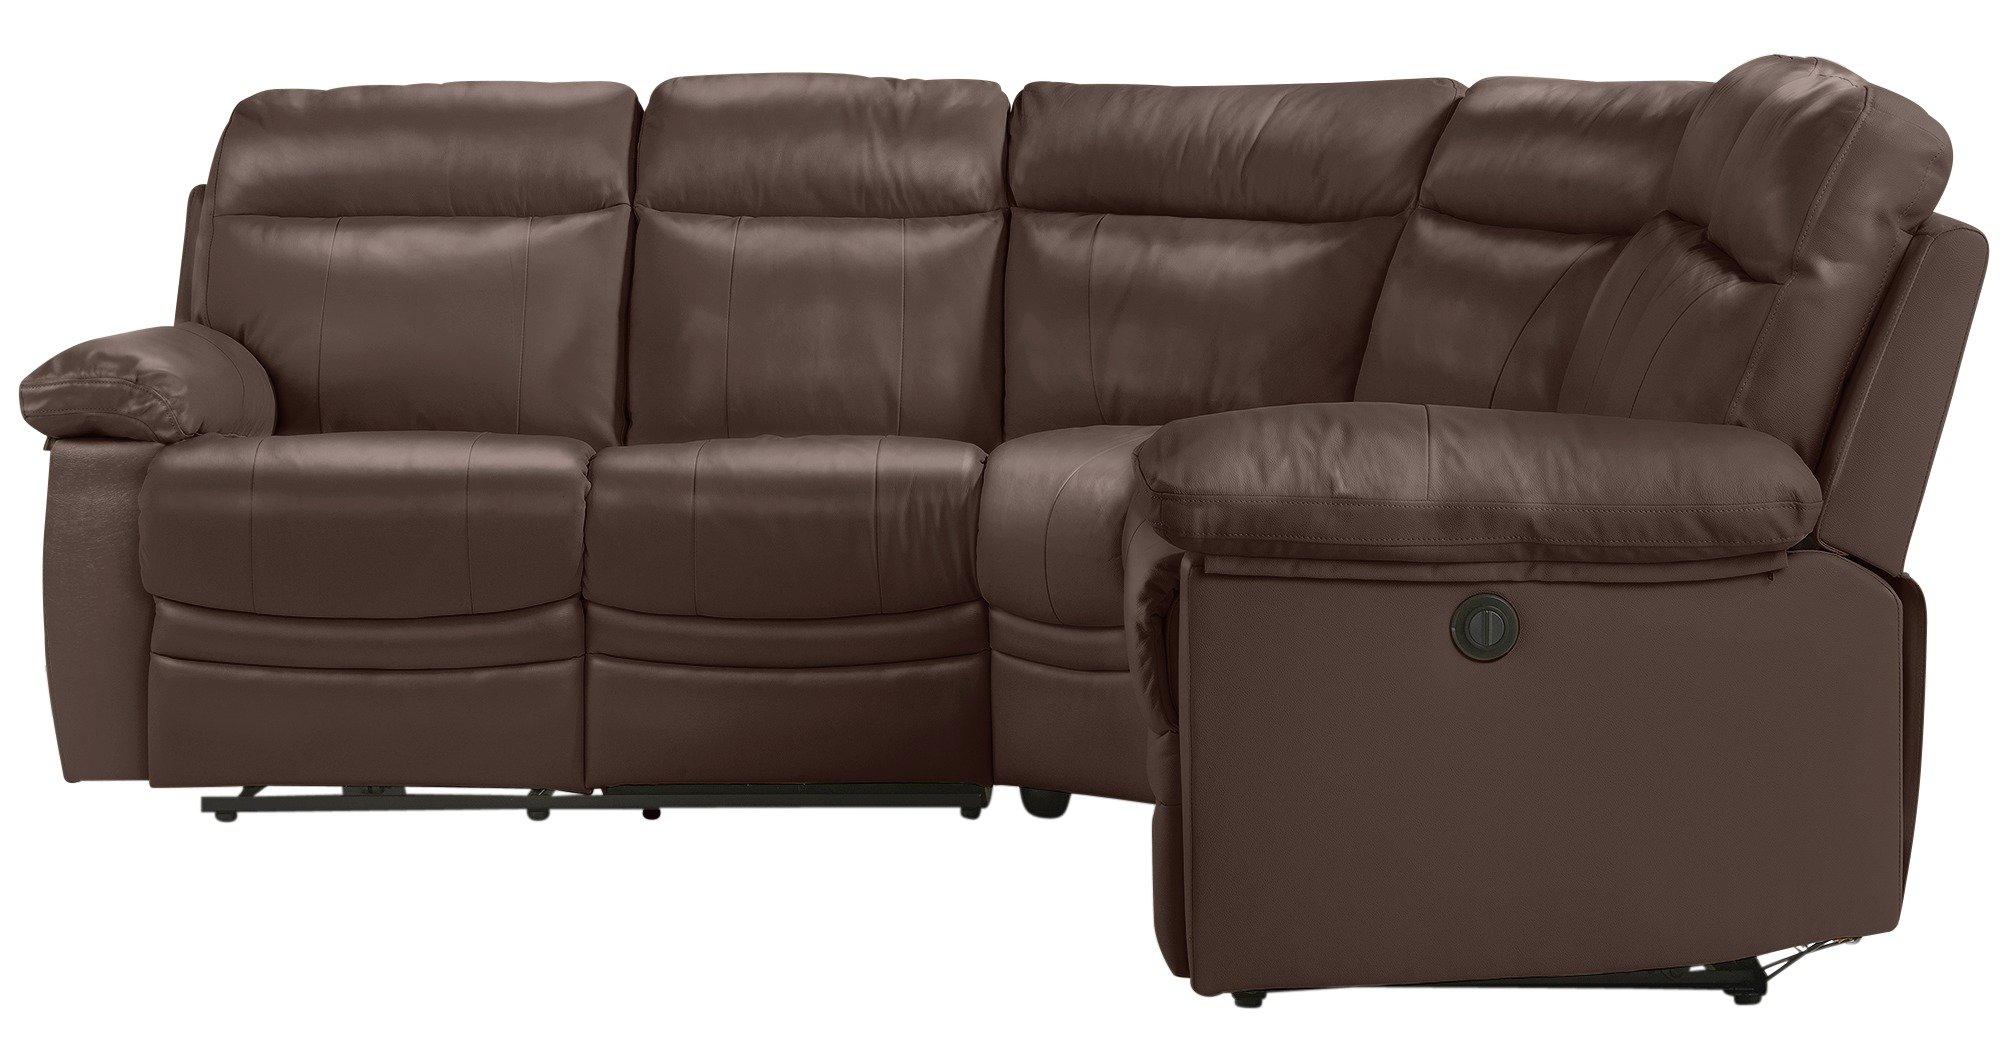 Paulo Leather Recliner Corner Sofa Group Chocolate